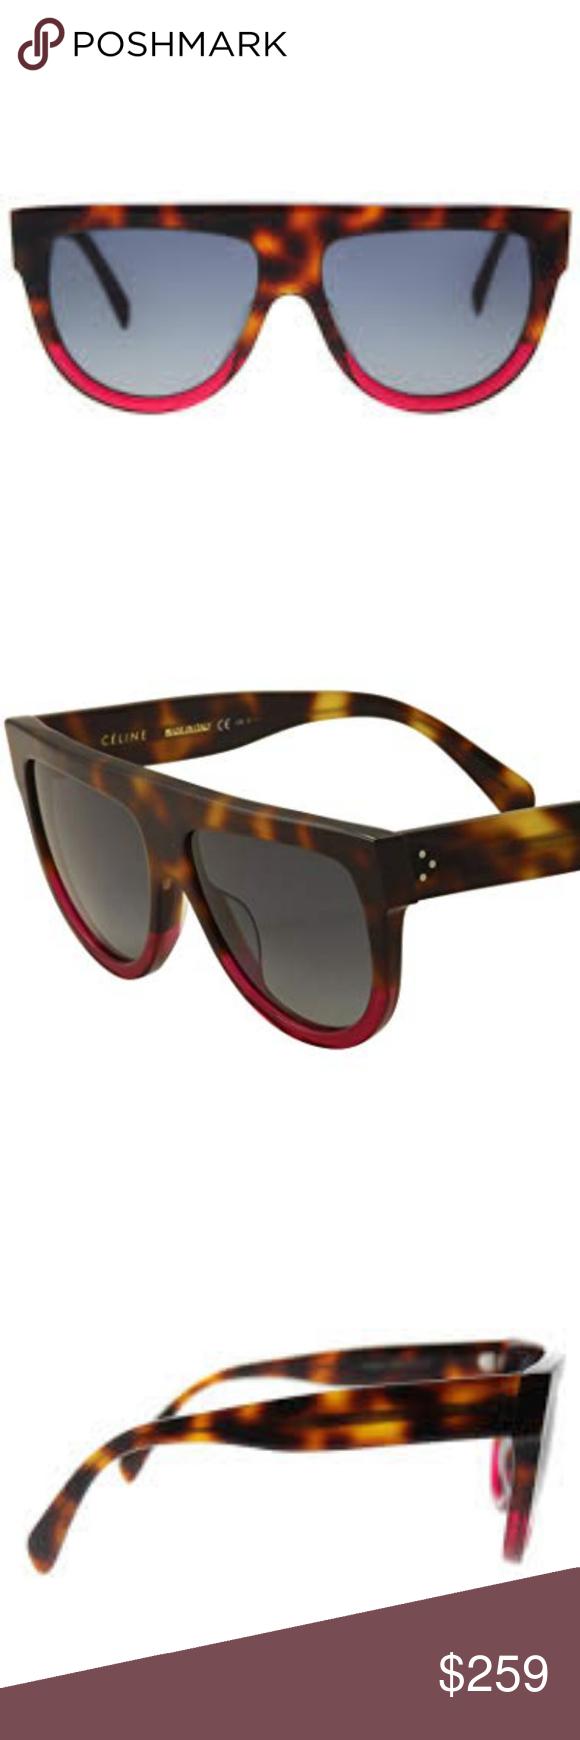 037df2ab189 CELINE Shadow FLAT TOP Sunglasses TORTOISE FUCHSIA CELINE CL 41026 S Shadow  FLAT TOP